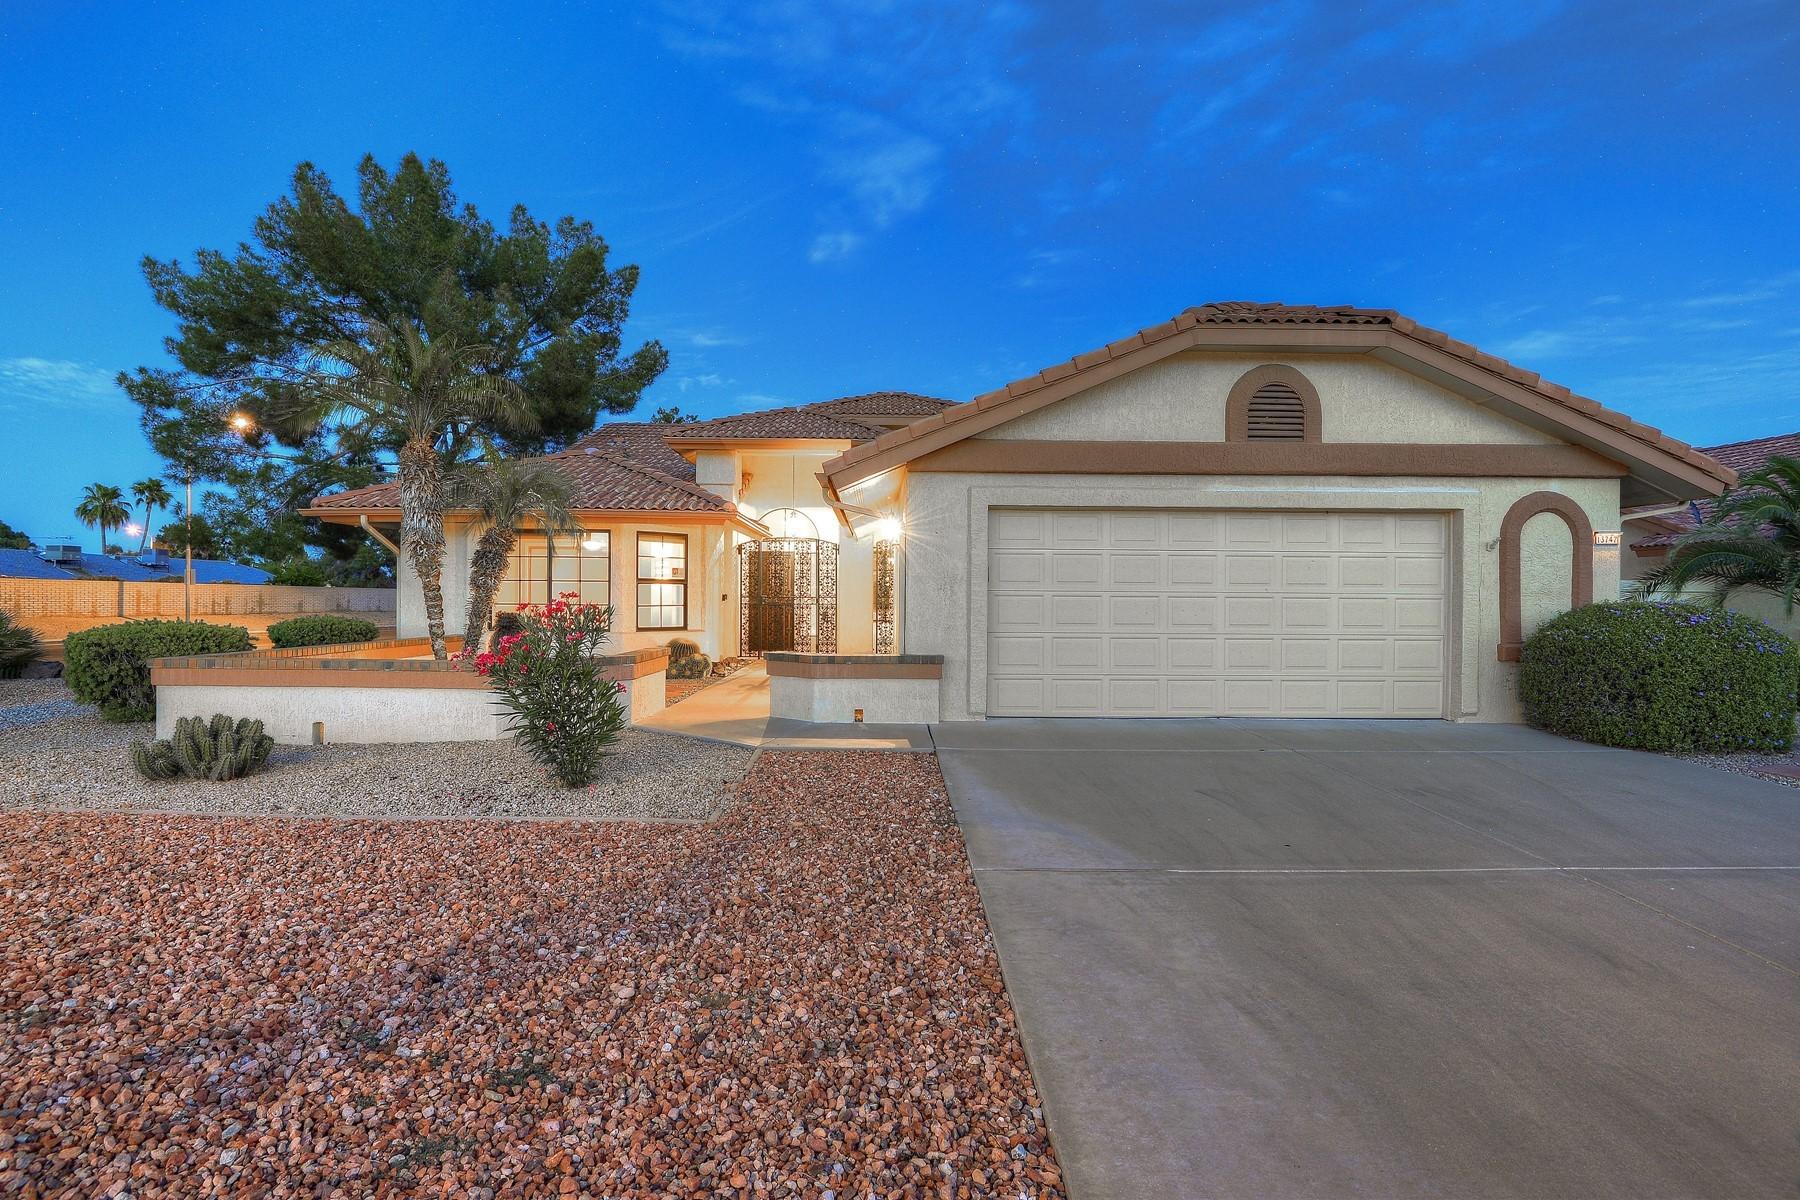 Single Family Homes για την Πώληση στο Sun City West 13747 W VILLA RIDGE DR, Sun City West, Αριζονα 85375 Ηνωμένες Πολιτείες